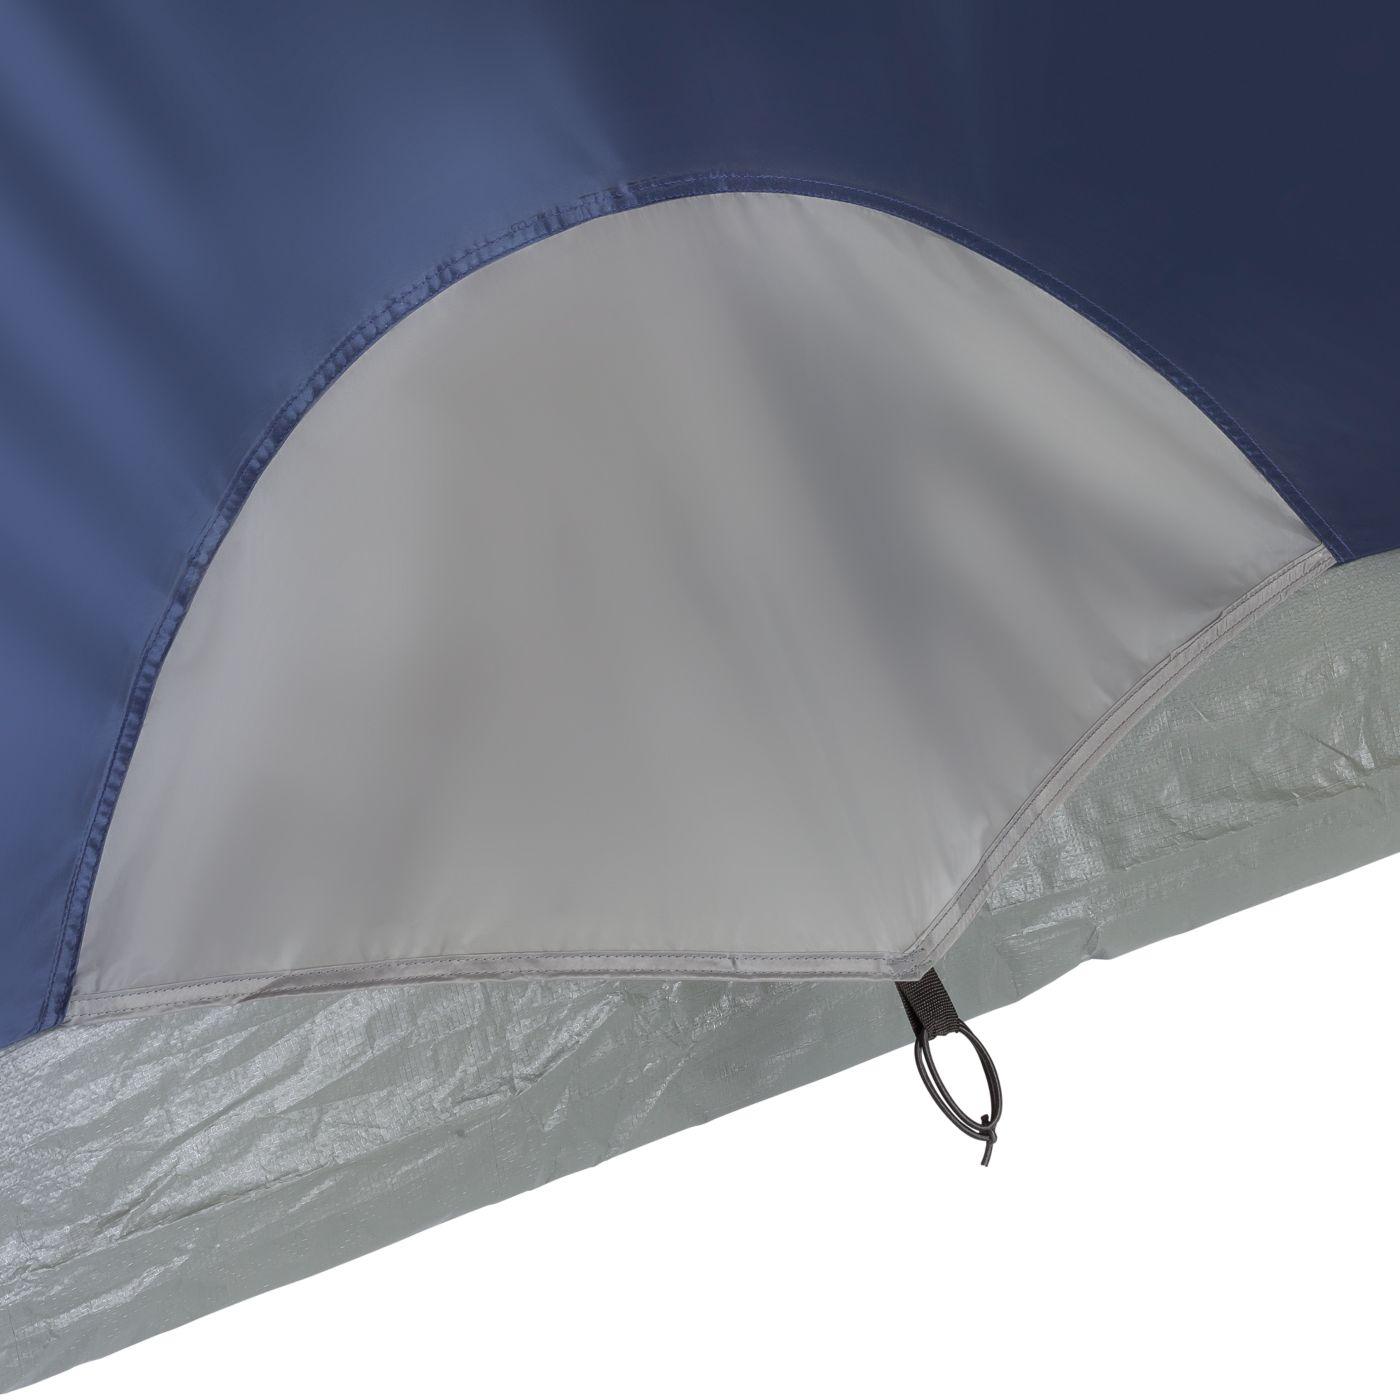 ... Sundome® 3-Person Dome Tent image 8 ...  sc 1 st  Coleman & Sundome® 3-Person Dome Tent | Coleman